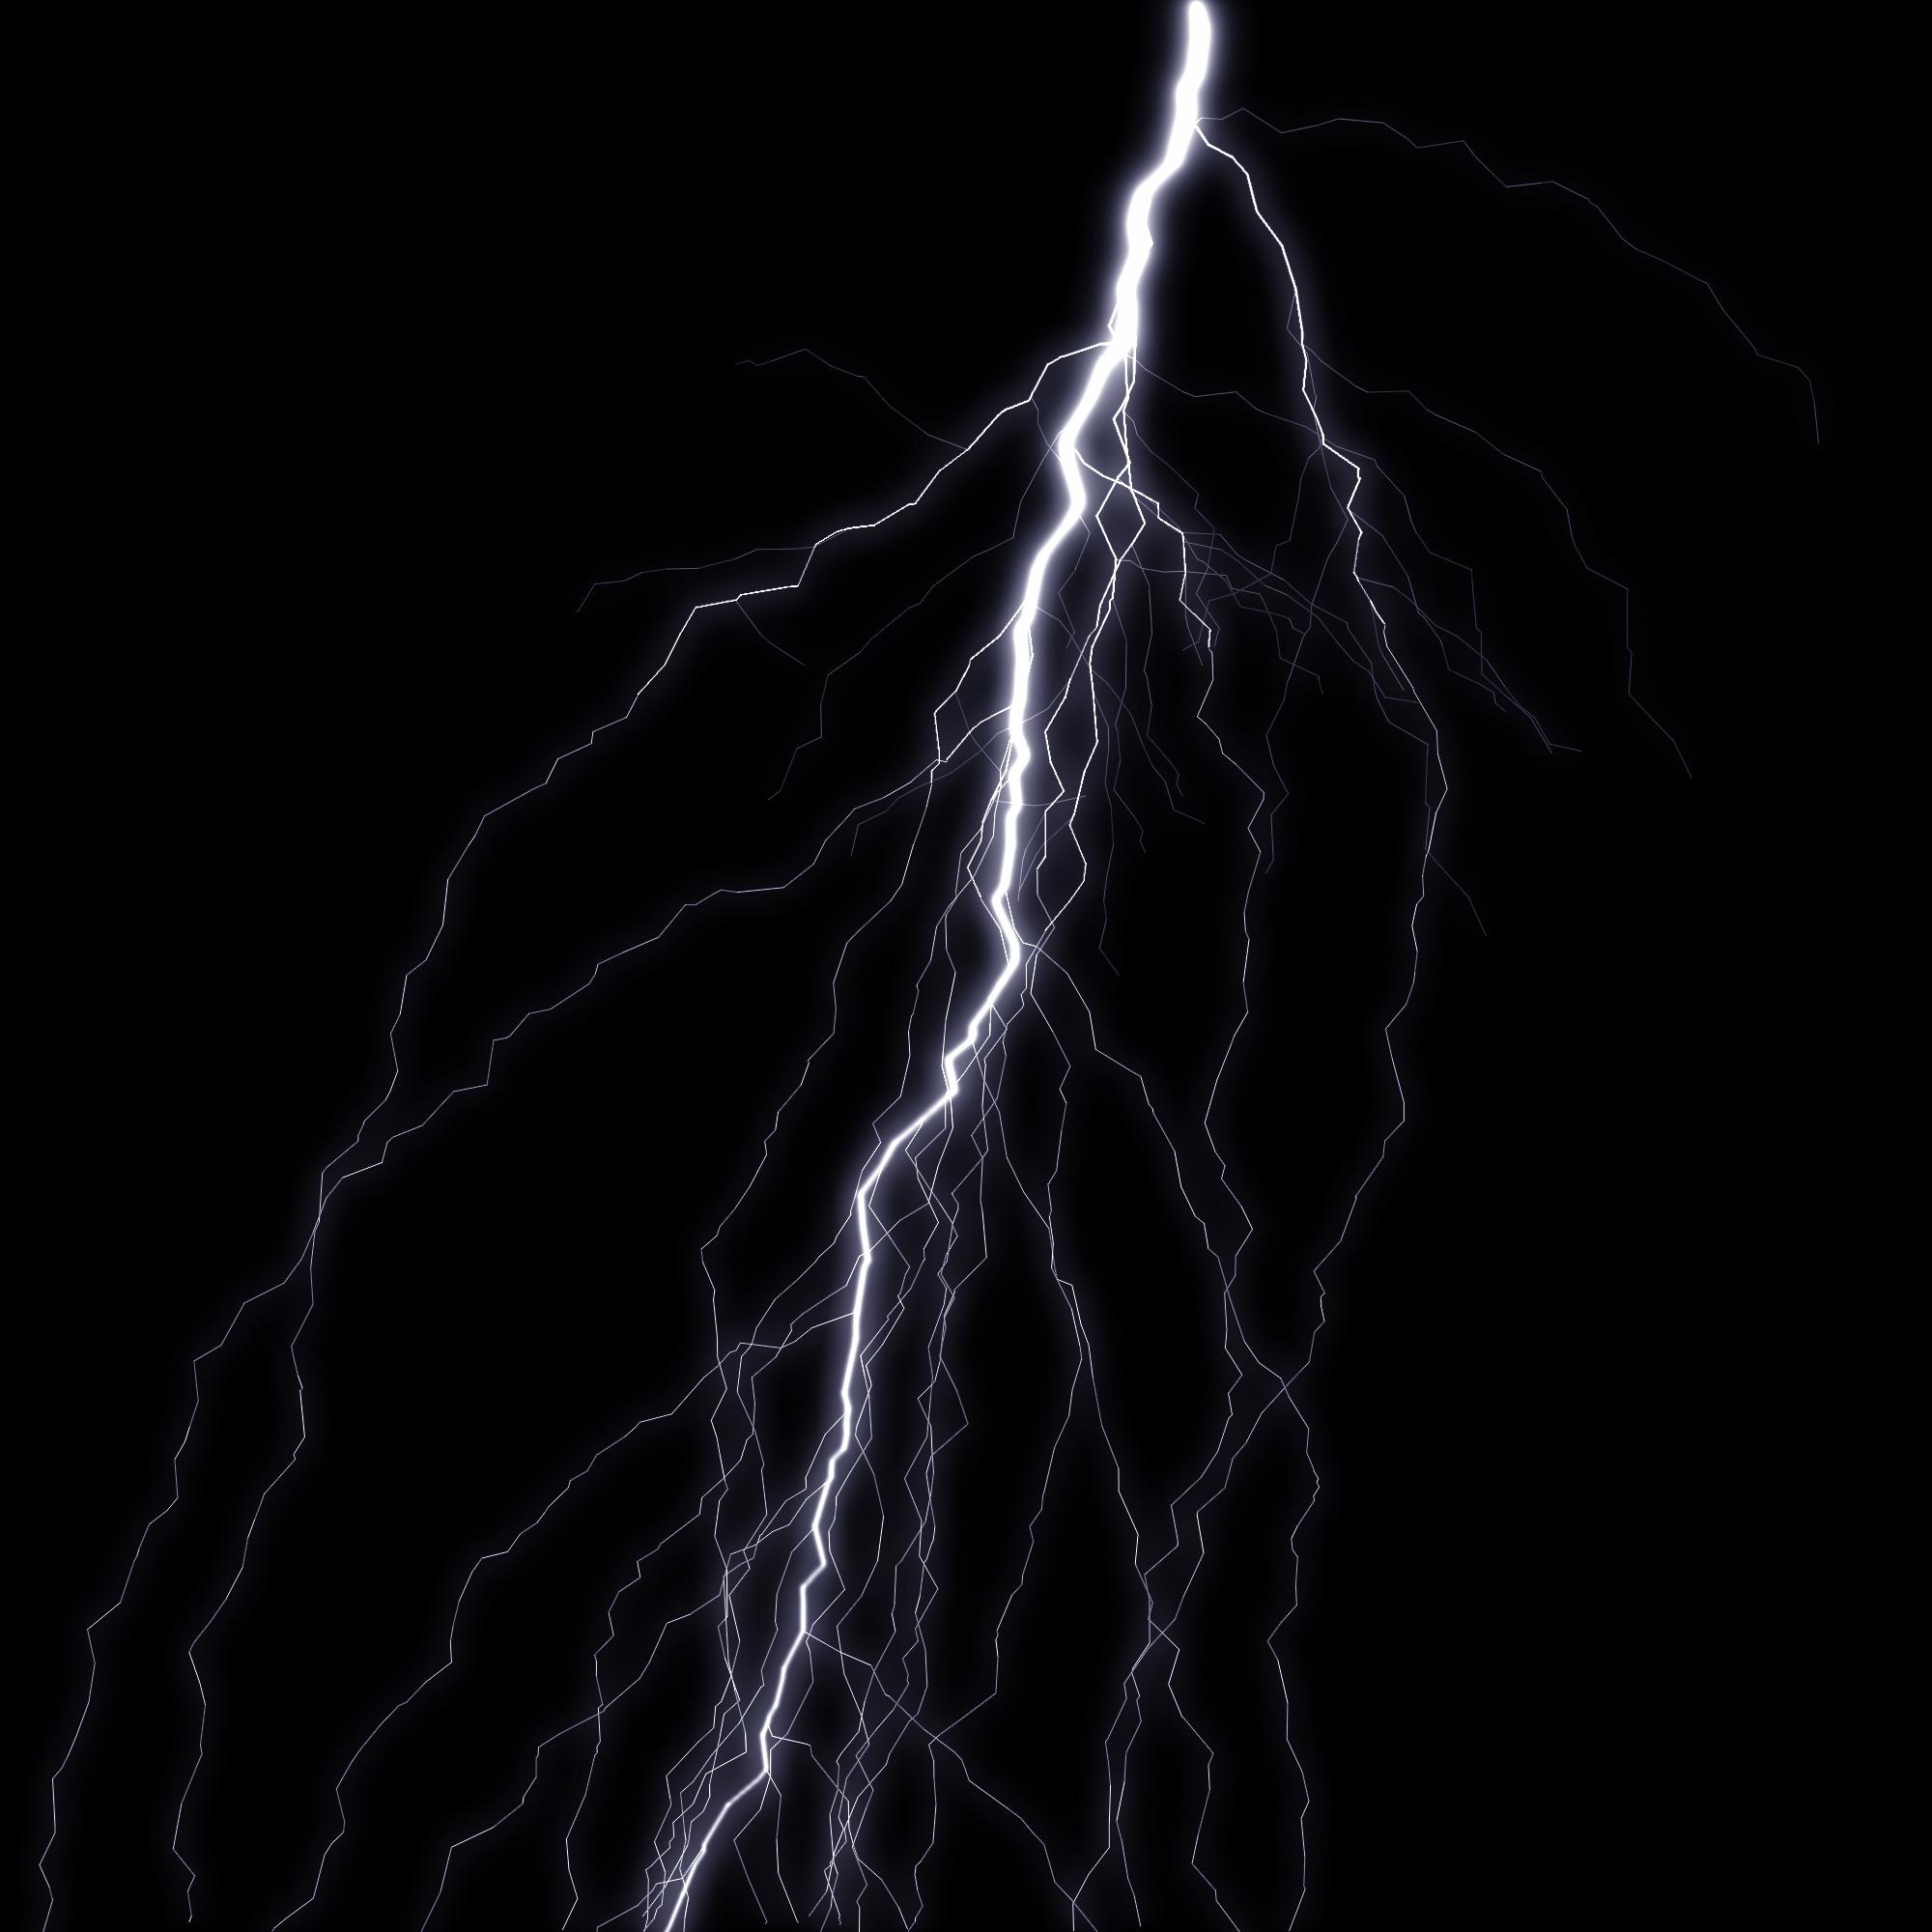 Lightening clipart lightning flash Bolt org cocolabor Lighting Lighting